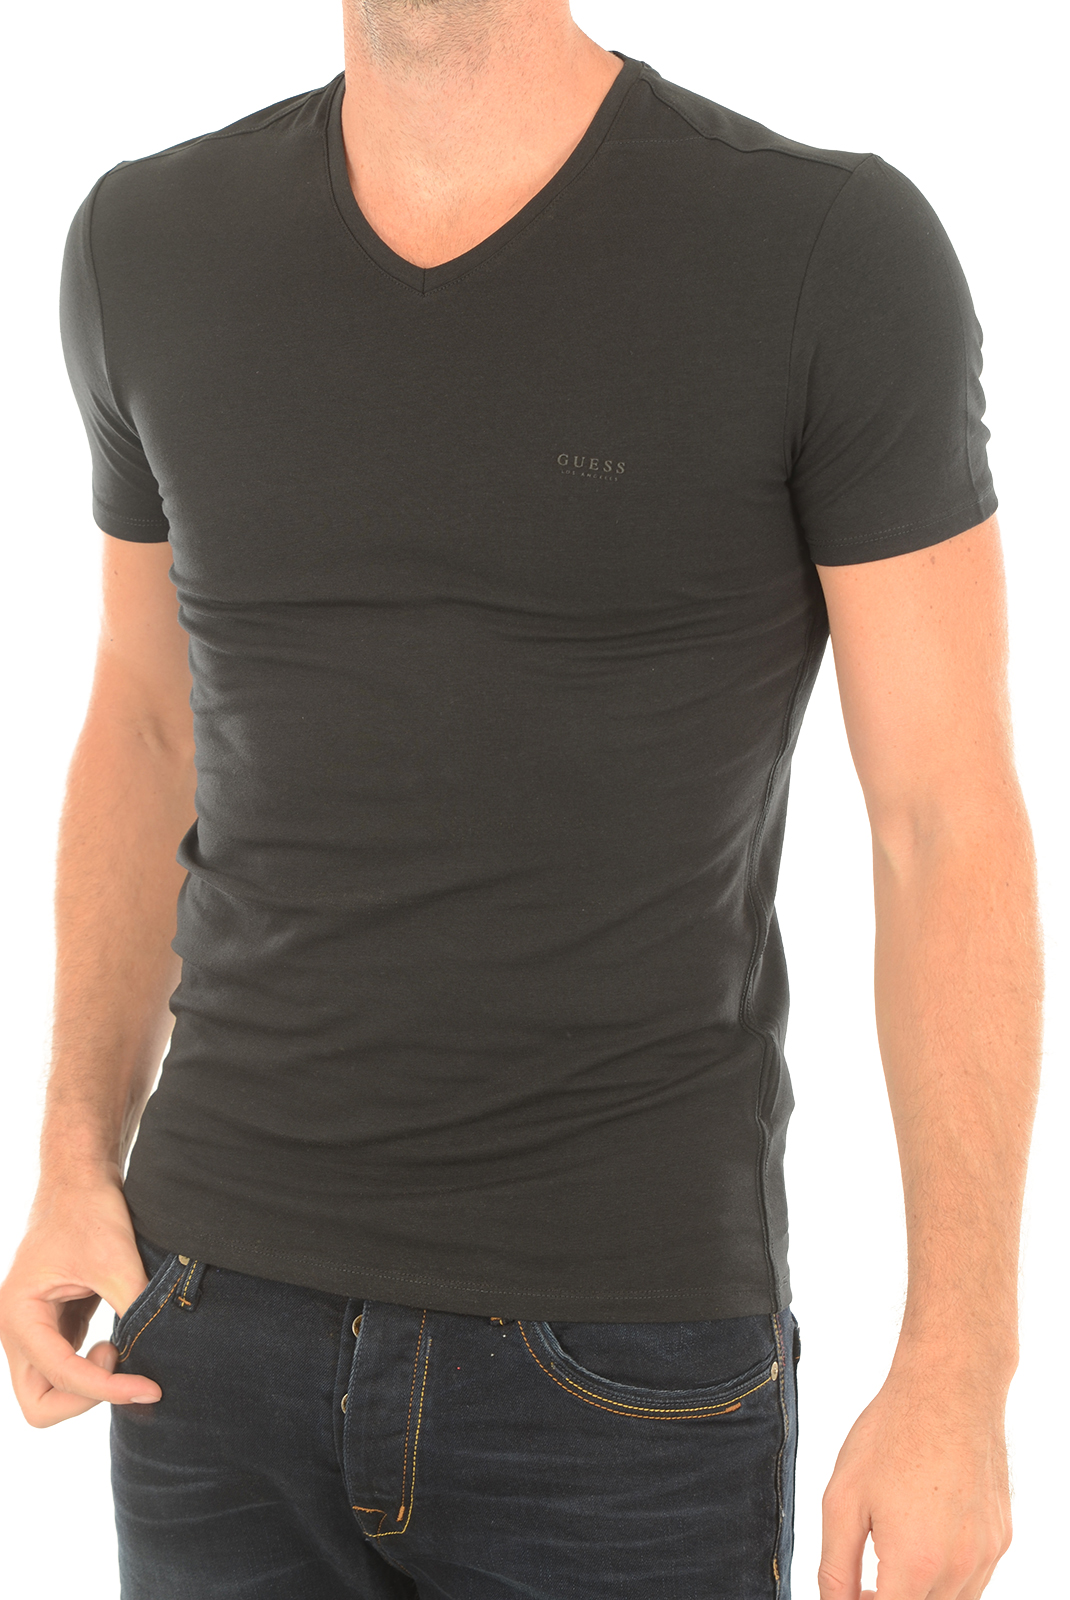 Tee-shirts manches courtes  Guess jeans M73I55 J1300 A996 NOIR